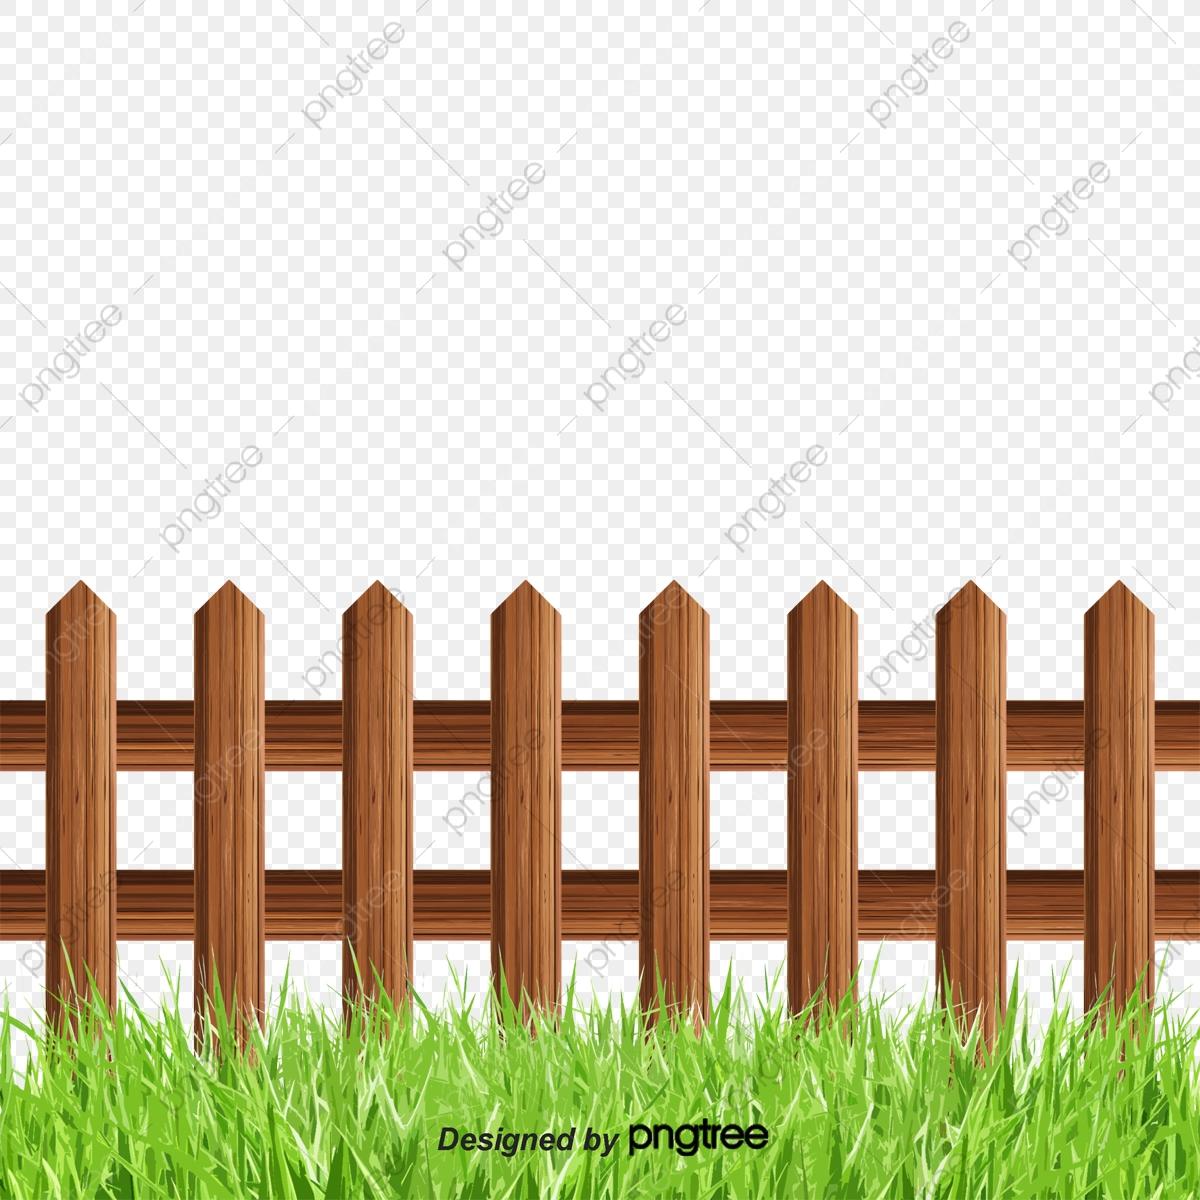 Fence clipart decorative fence. Wooden png transparent